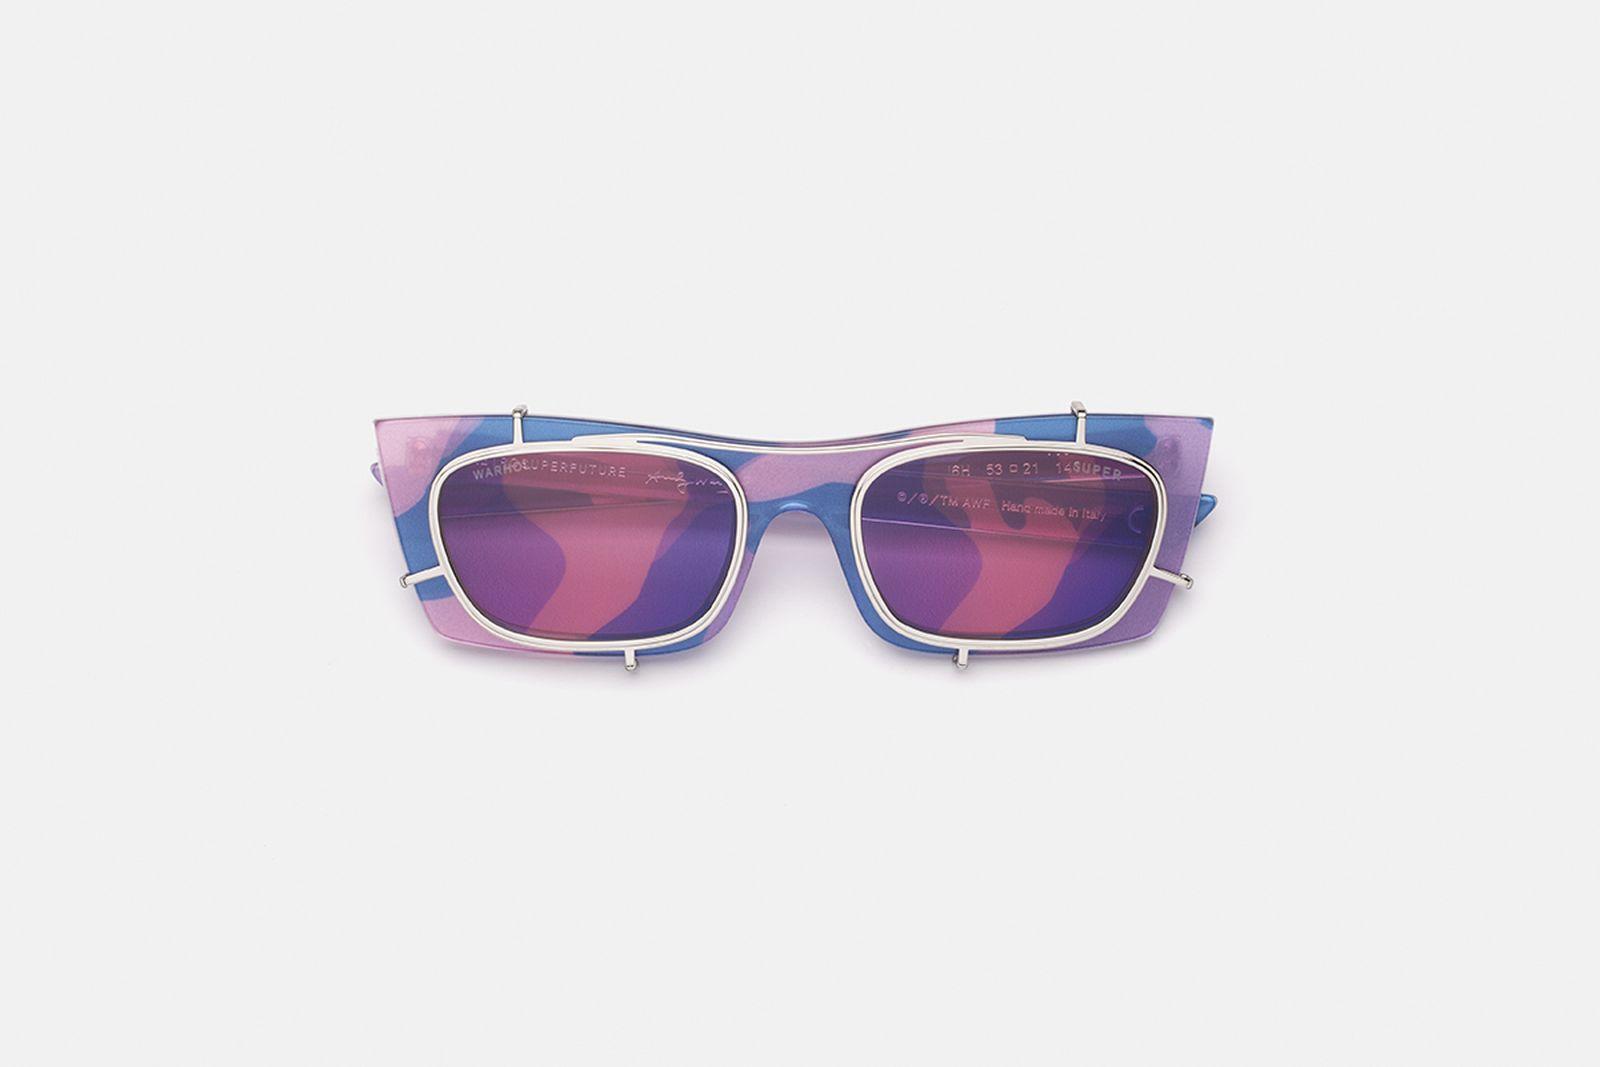 retrosuperfuture andy warhol sunglasses